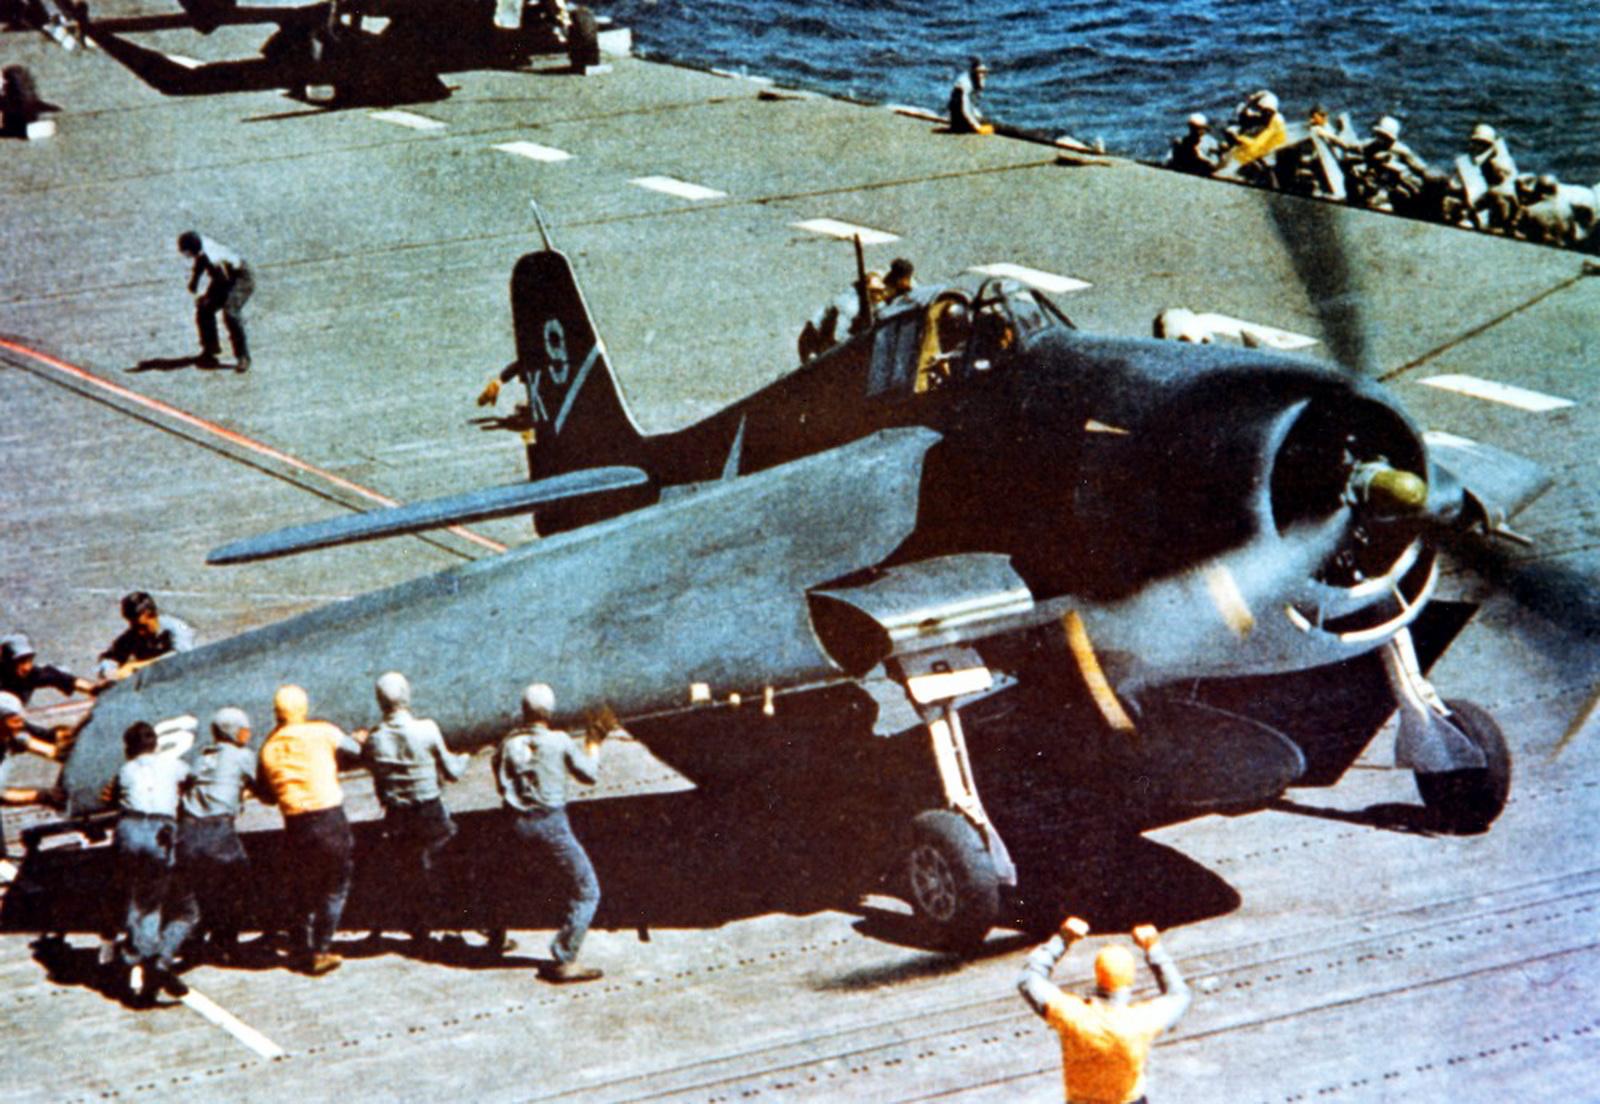 Deck crew of uss yorktown extending the wing of a hellcat fighter